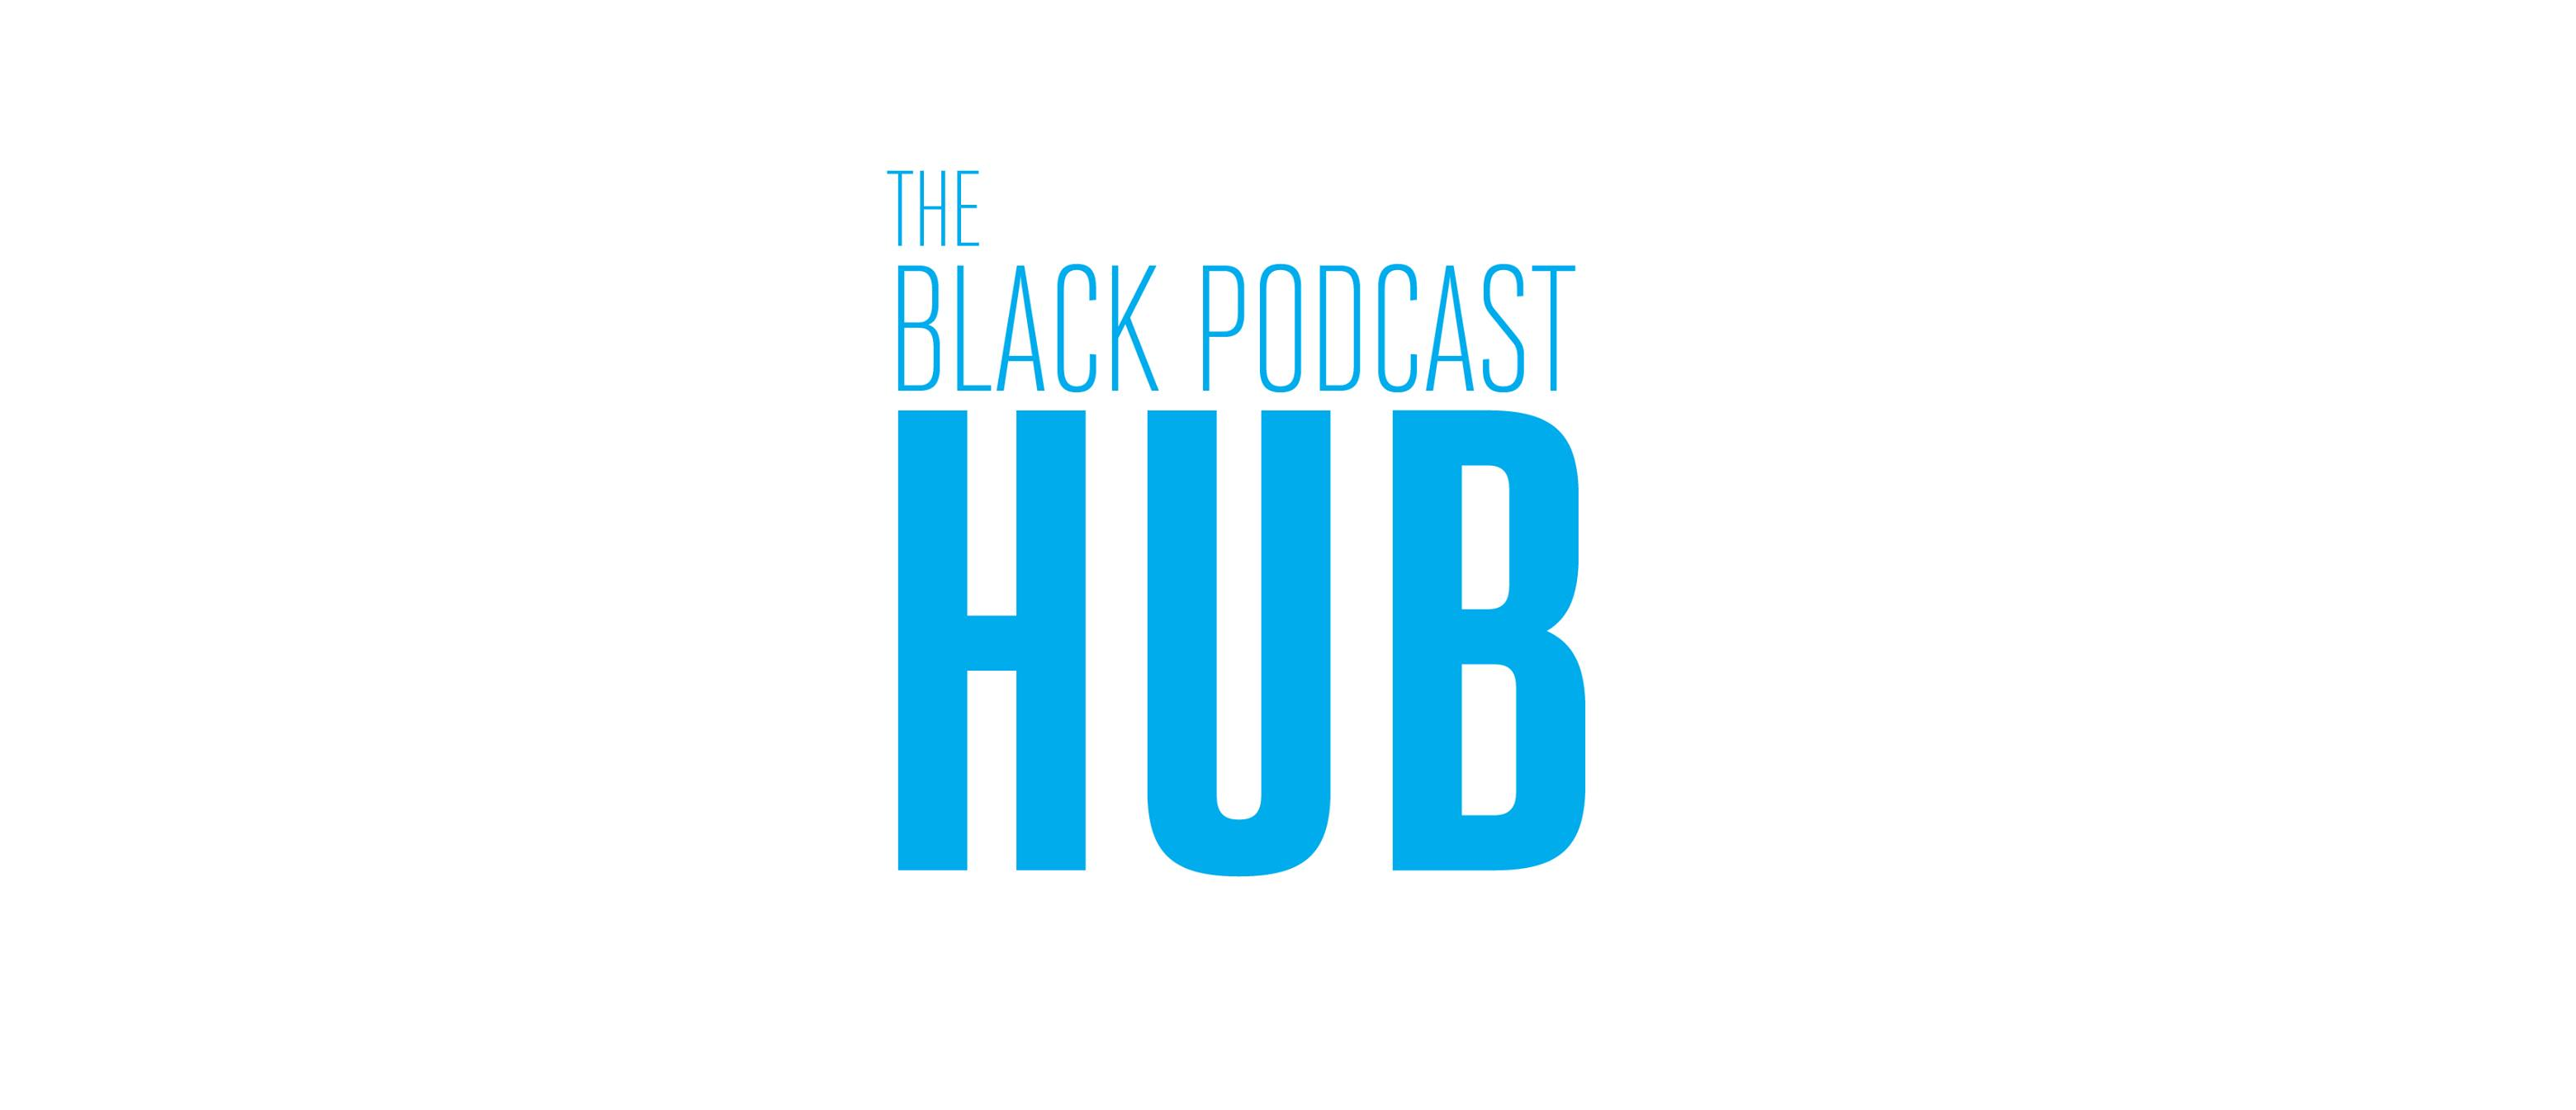 The Black Podcast Hub